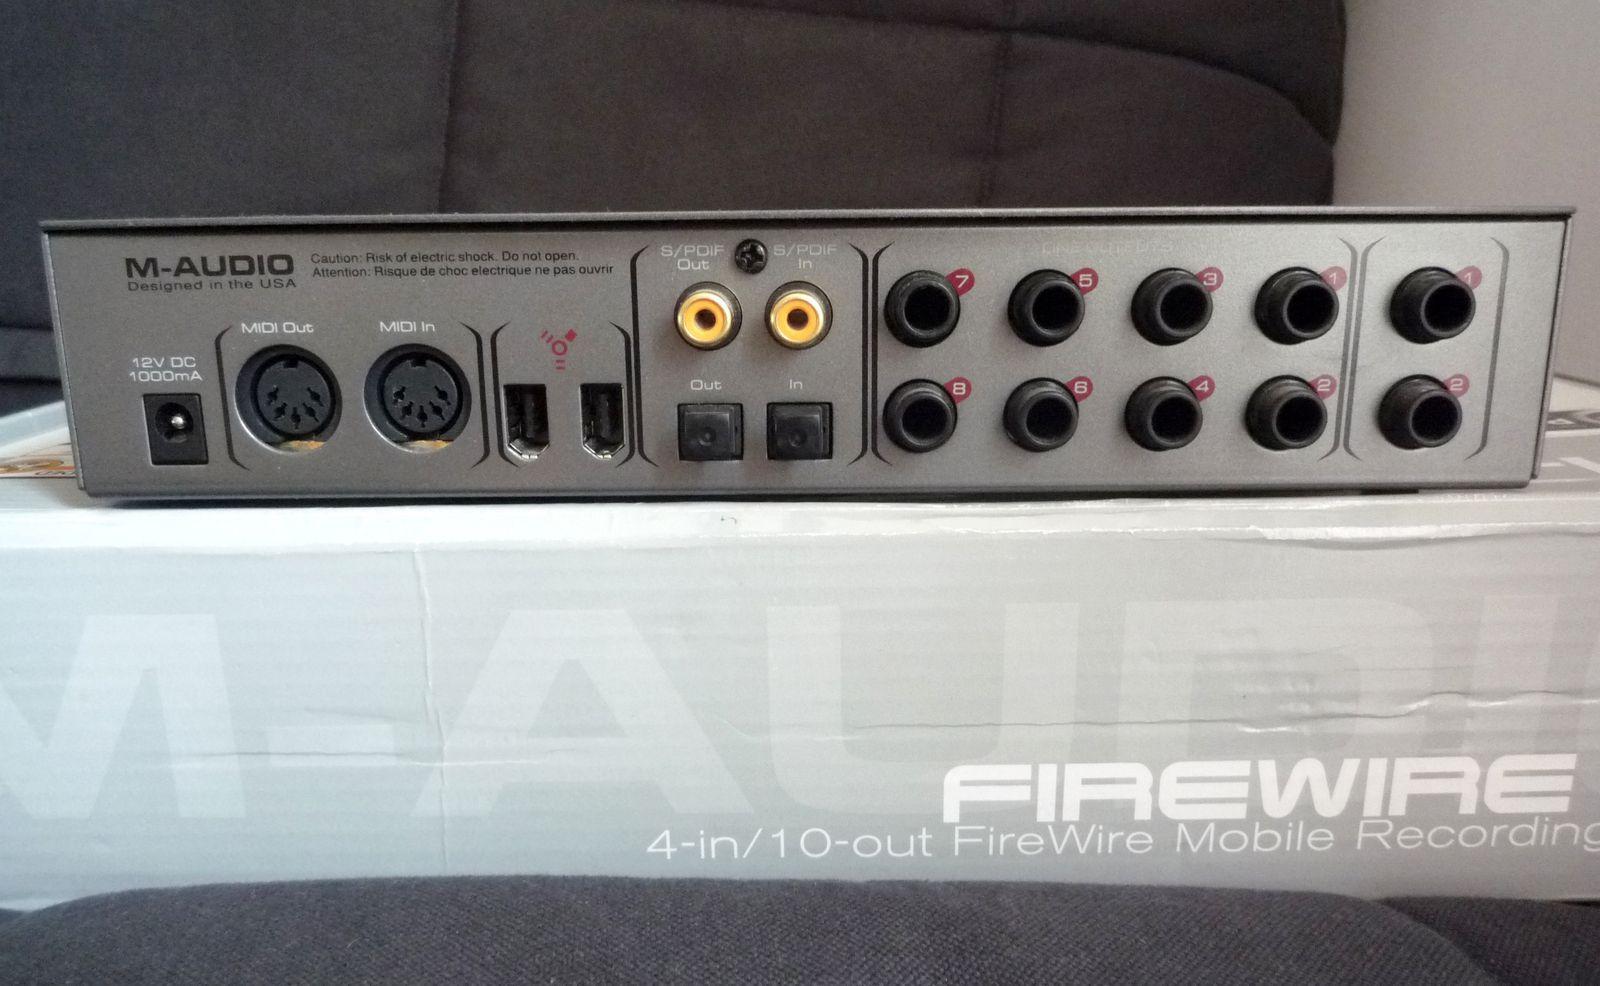 M-Audio Firewire 410 image (#222120) - Audiofanzine